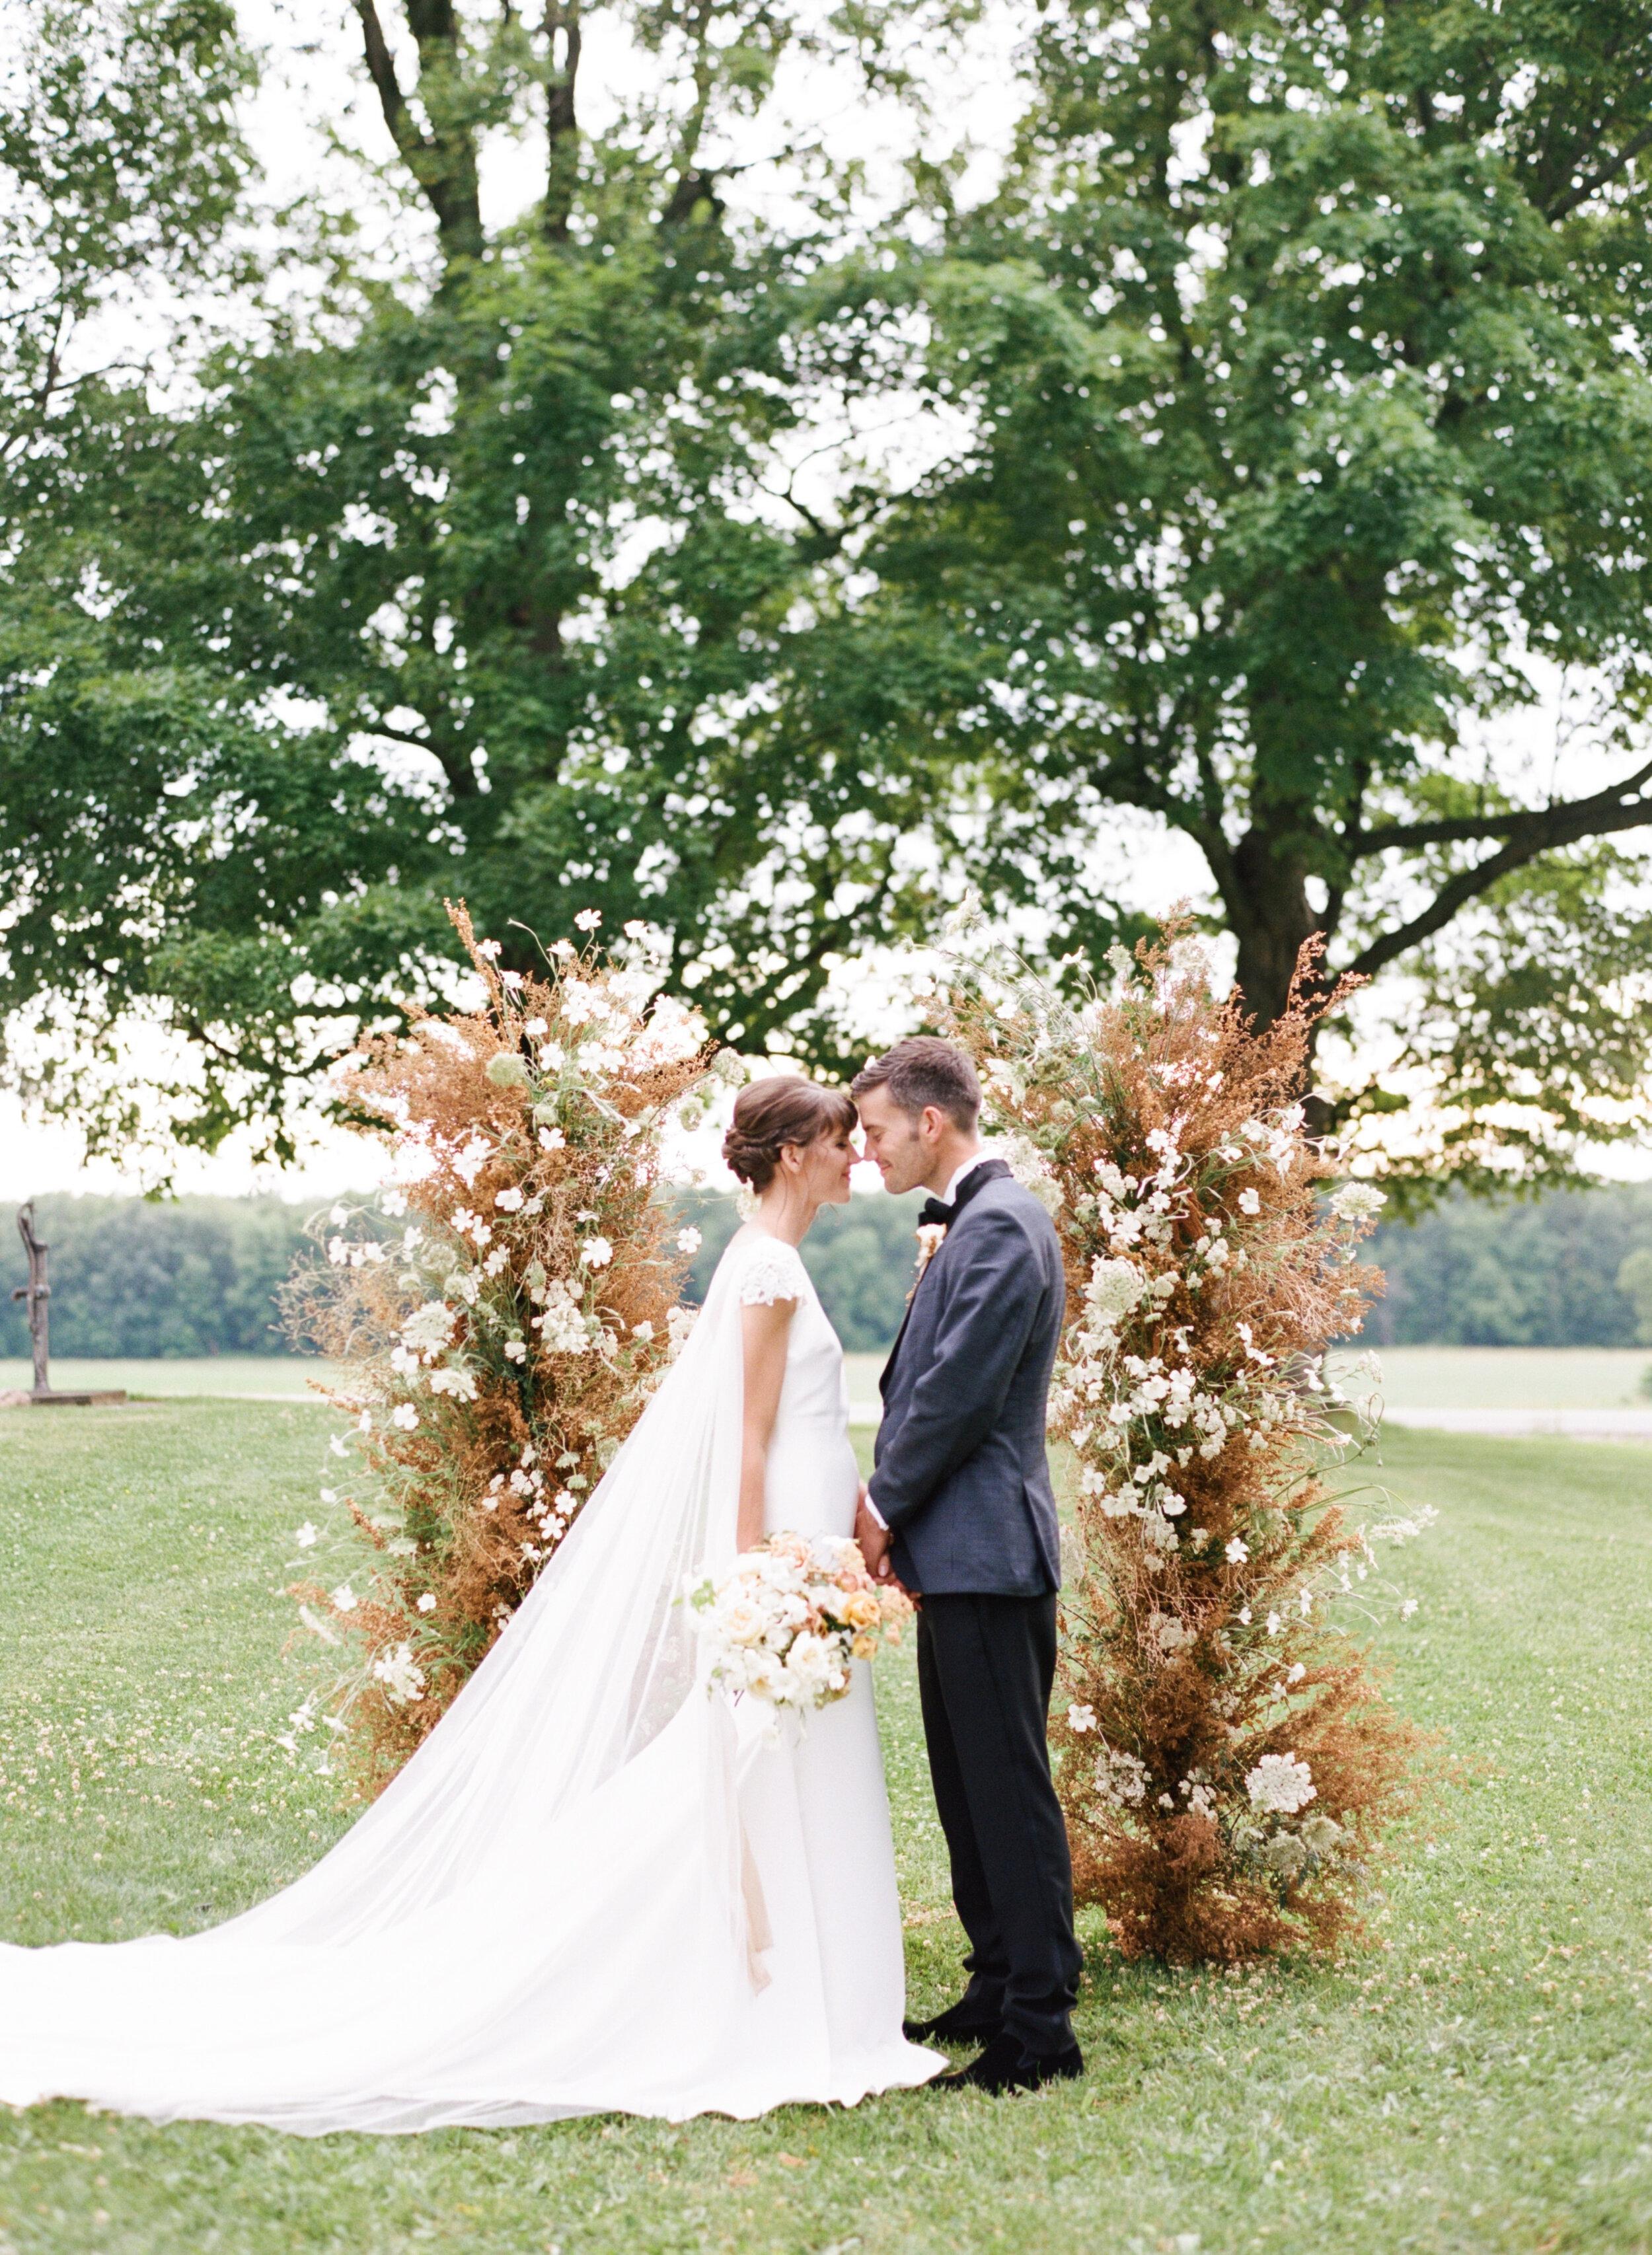 alexandra-meseke-understated-soft-luxury-wedding-upstate-ny_0102.jpg